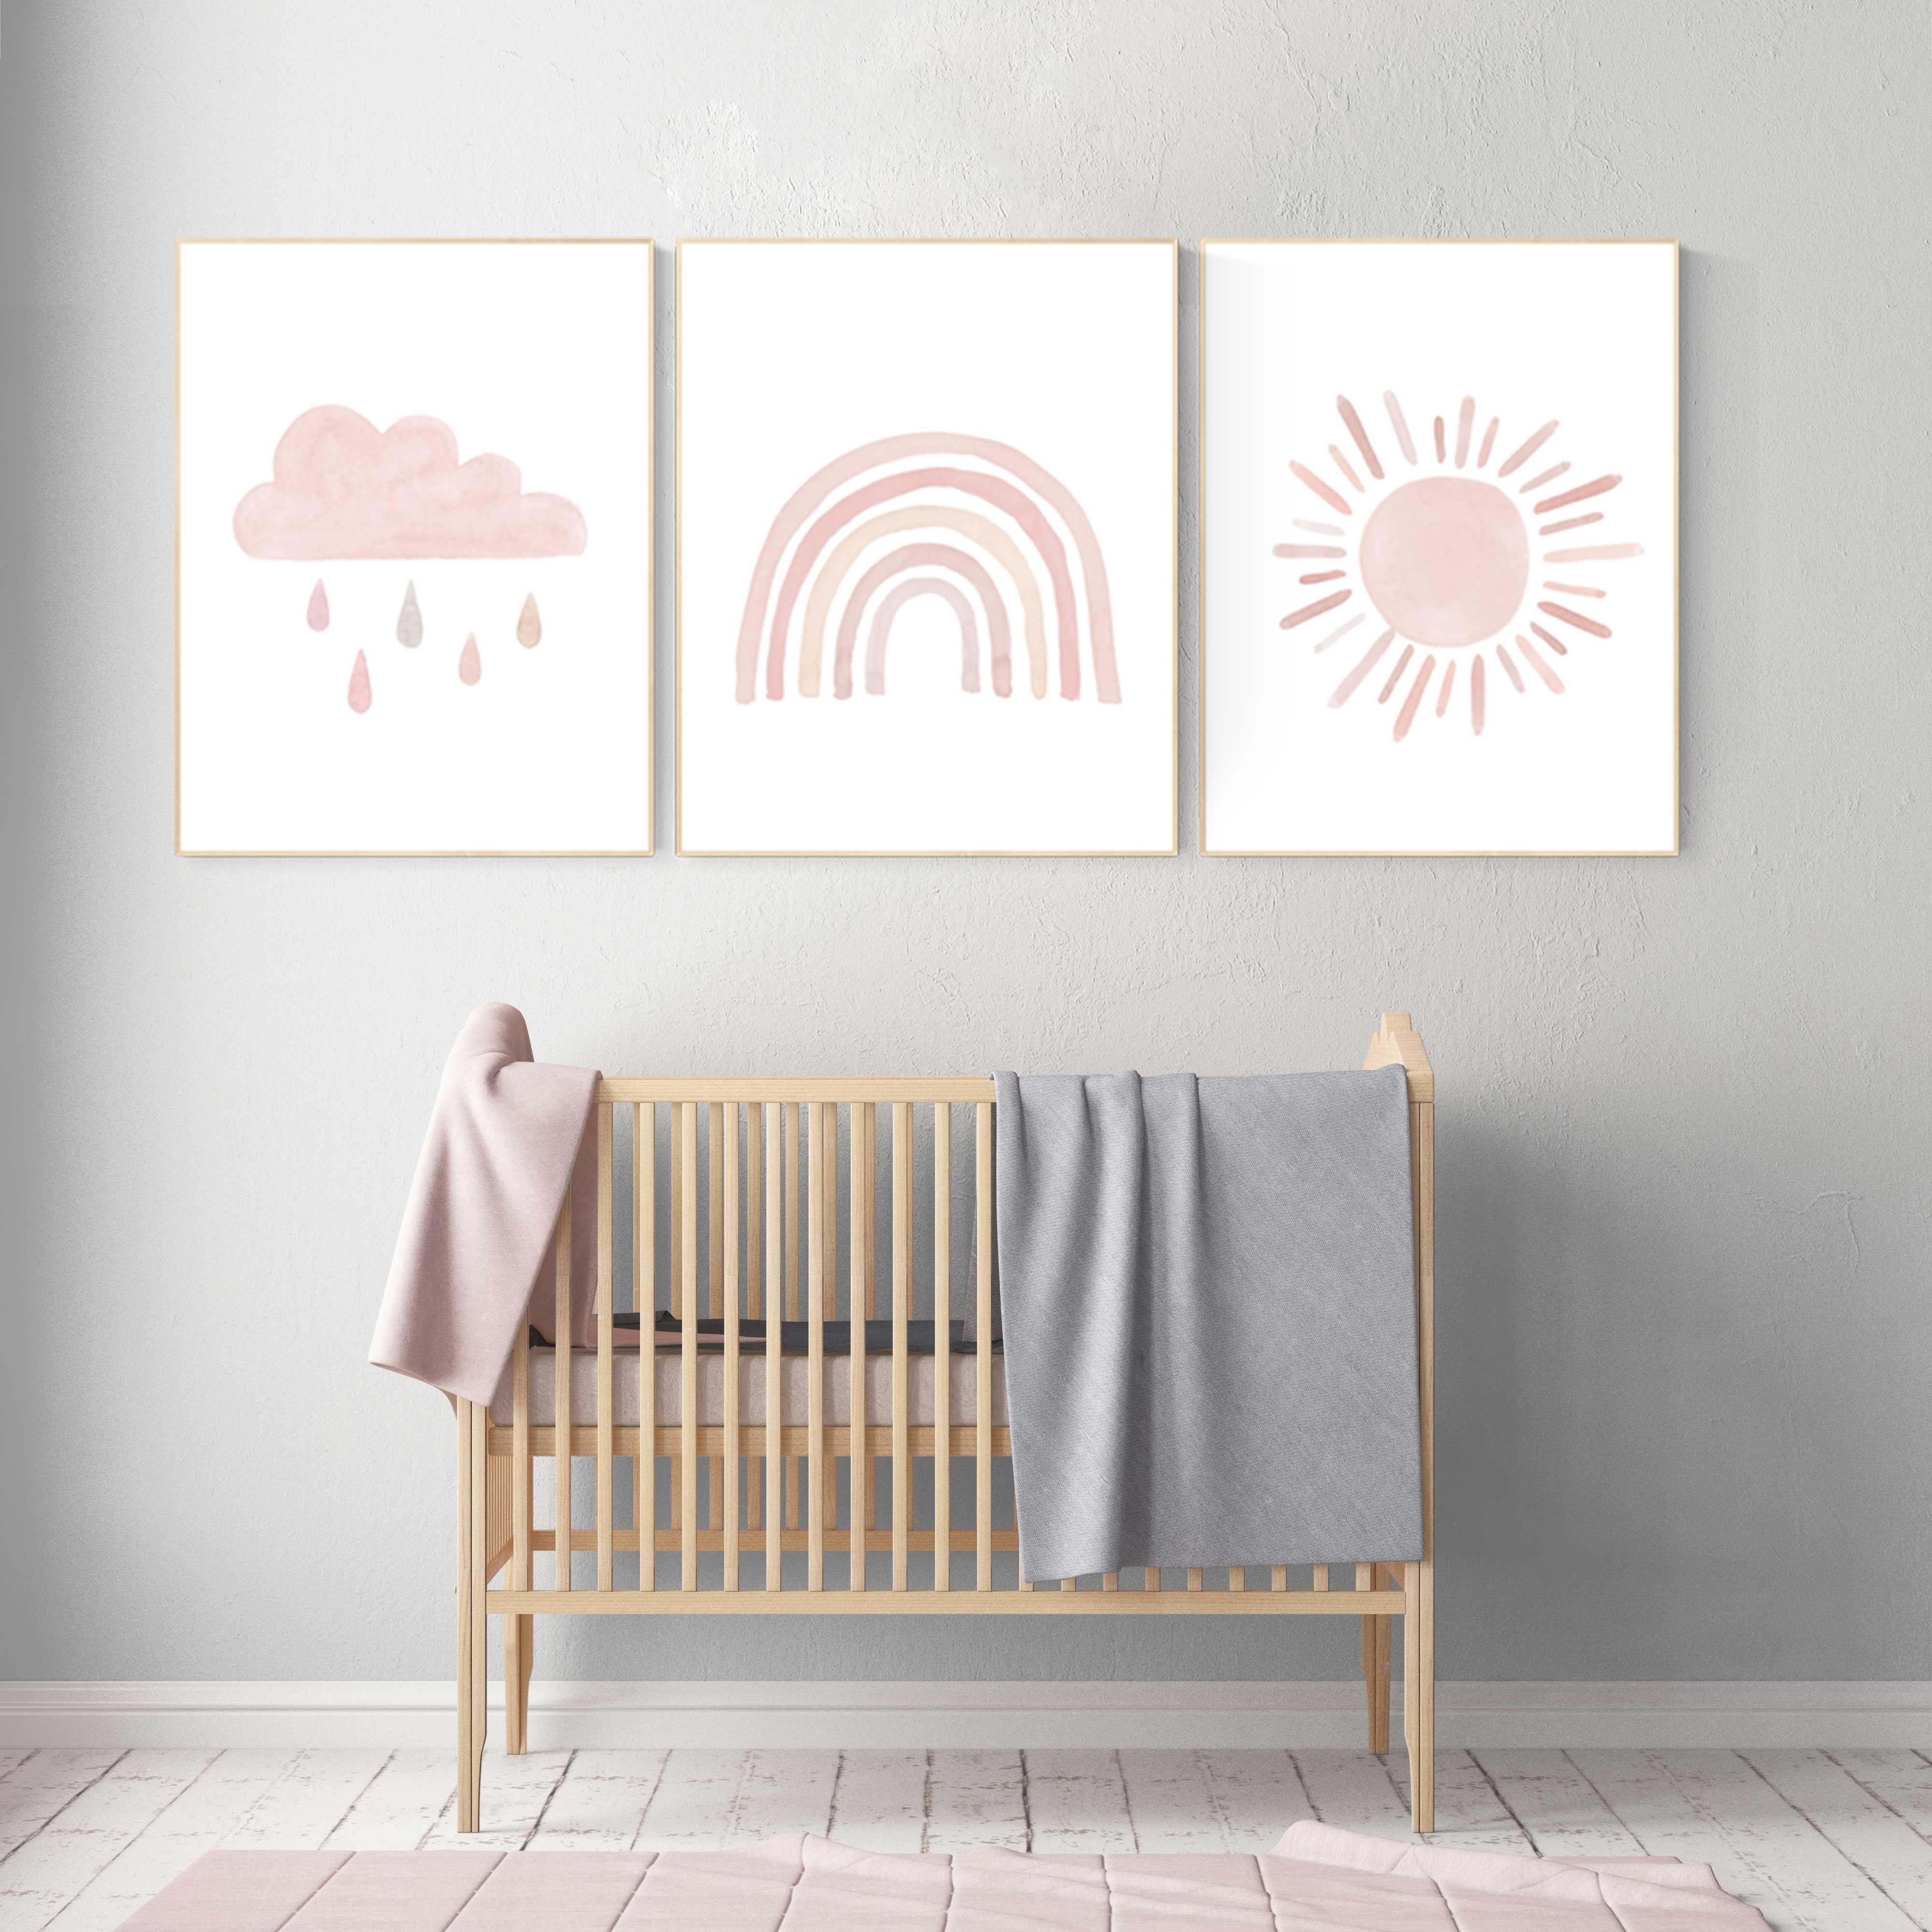 Nursery Prints Rainbow Nursery Decor Girl Nursery Wall Art Blush Pink Moon Star Cloud Nursery Wall Art Light